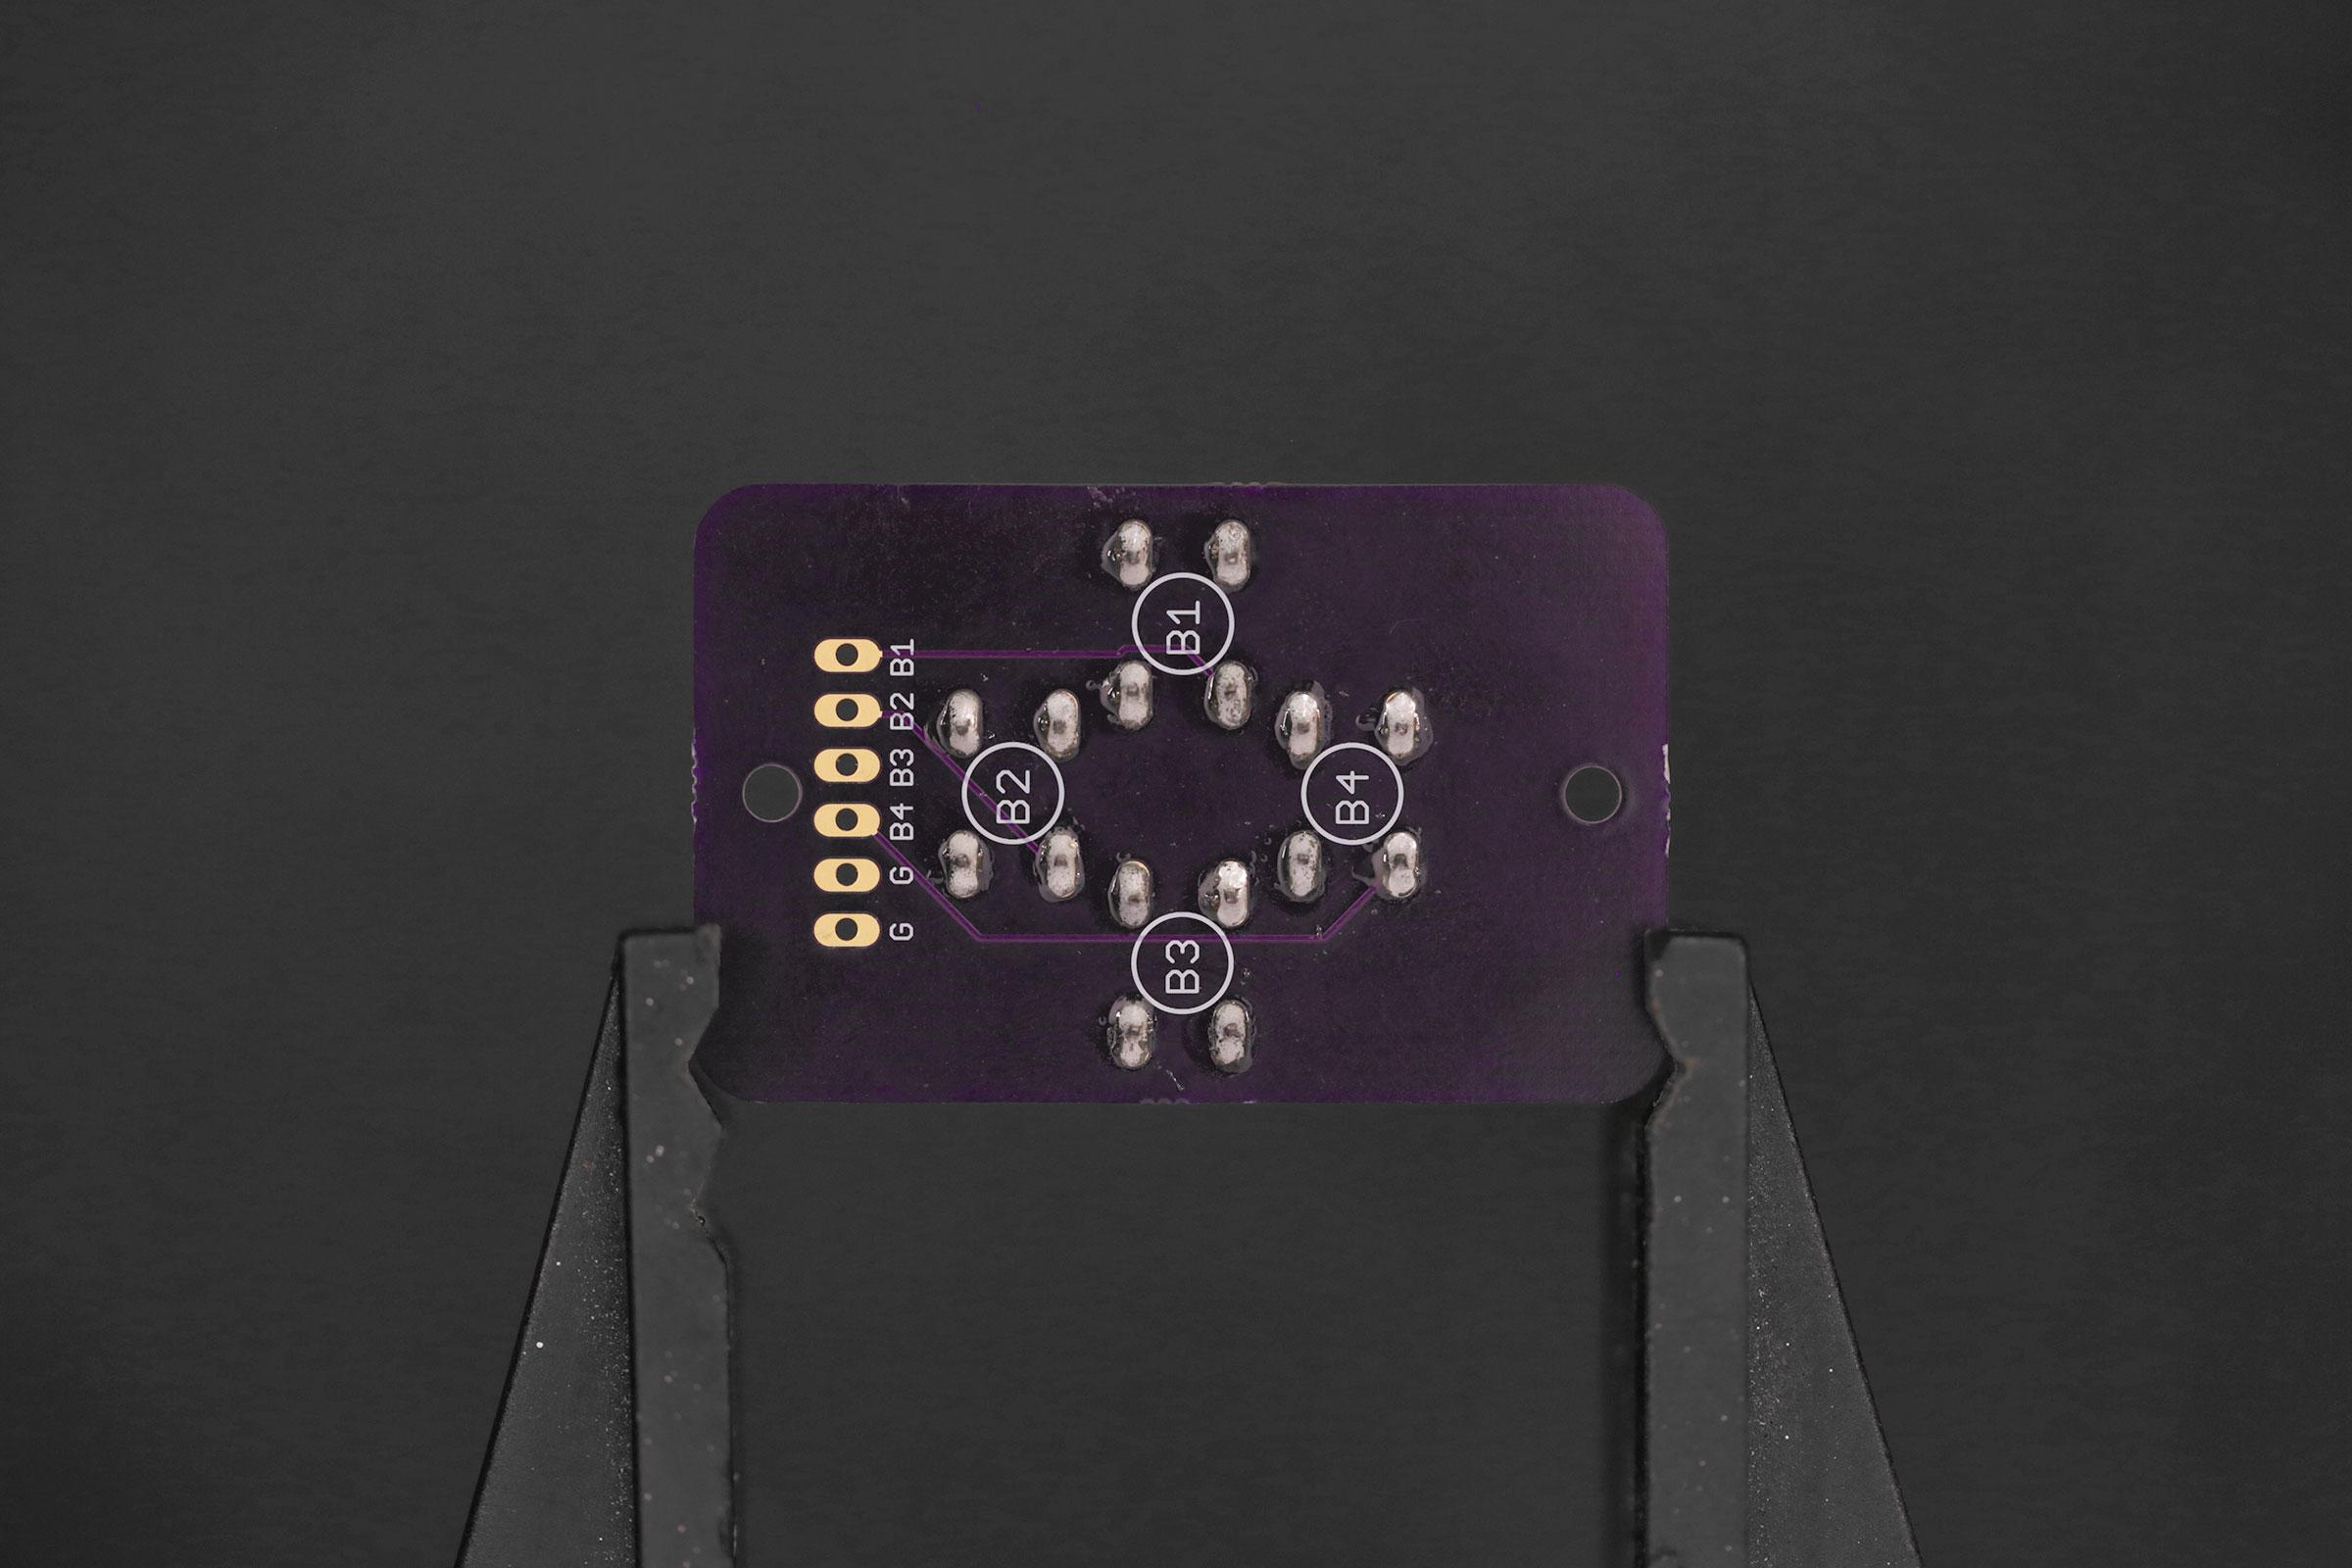 raspberry_pi_gamepad-buttons-soldered.jpg